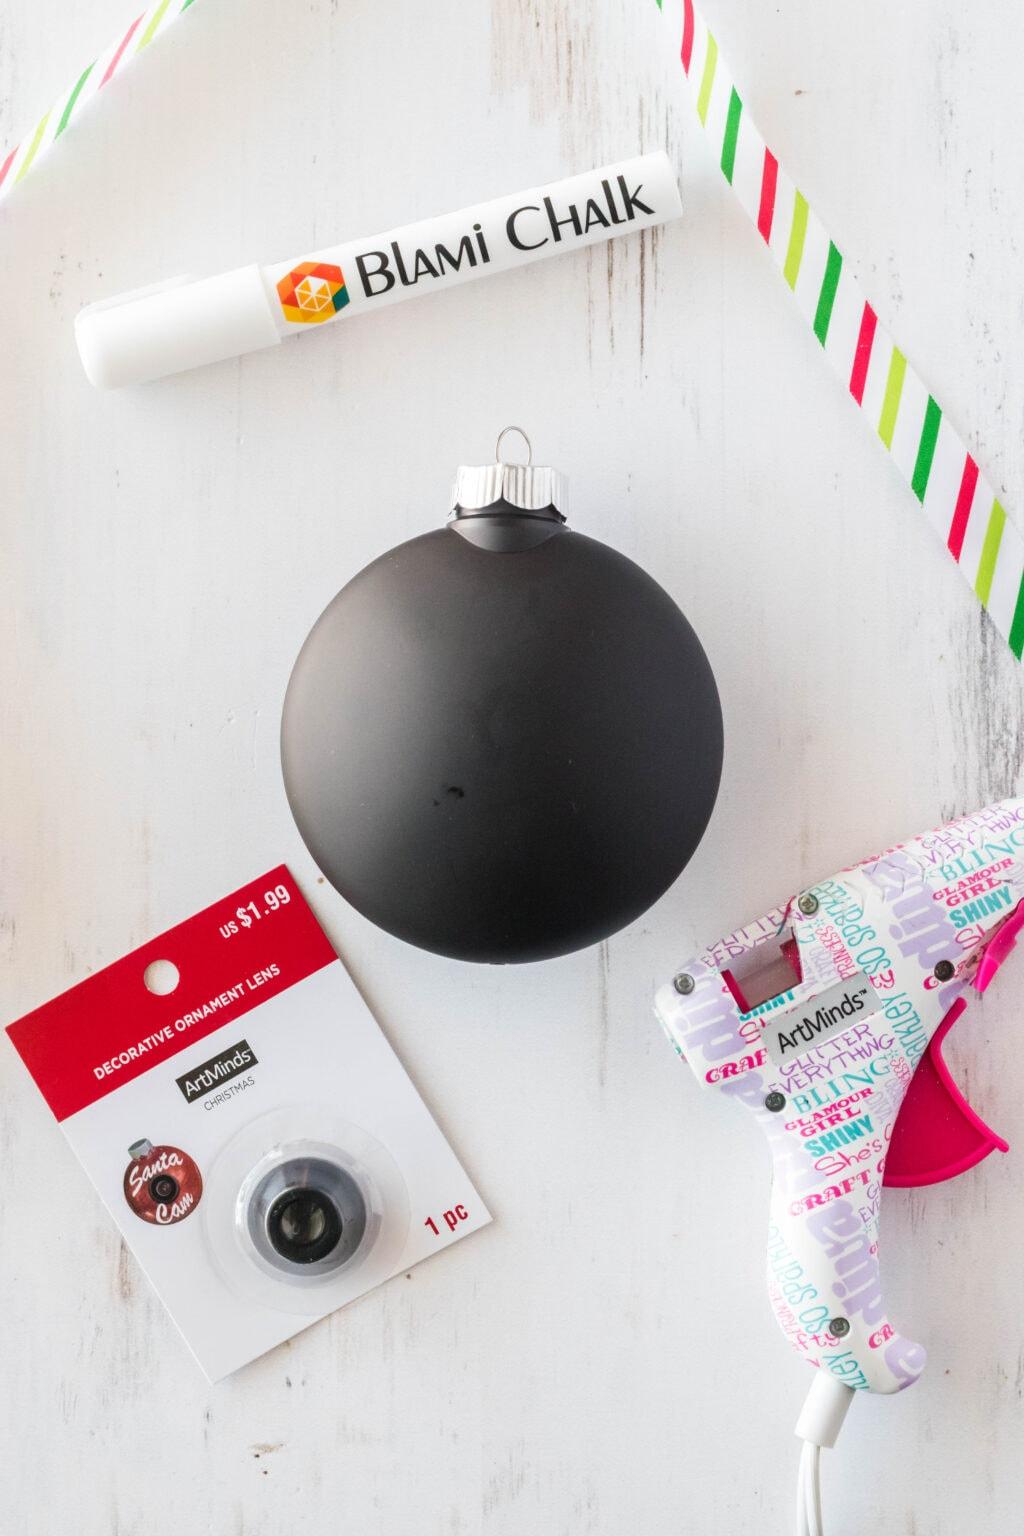 santa cam ornament supplies on table